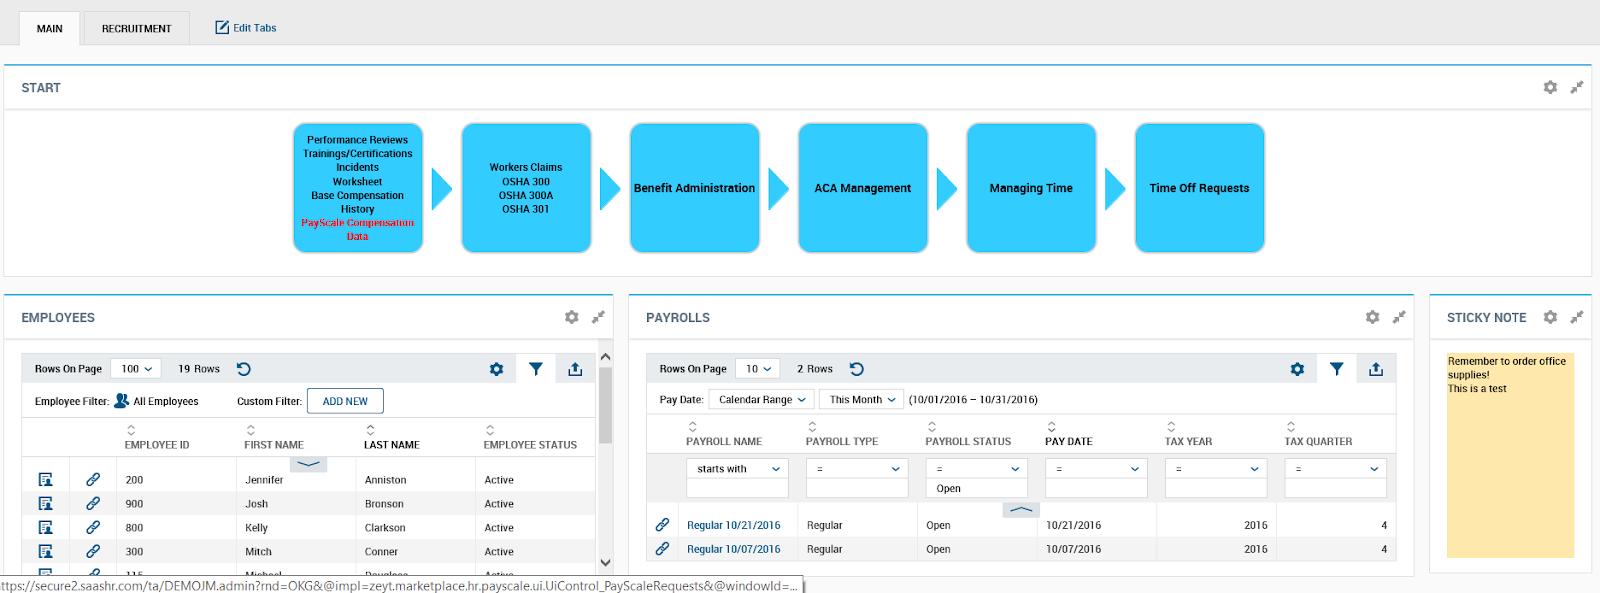 Kronos Workforce Ready Administrator Dashboard Screenshot